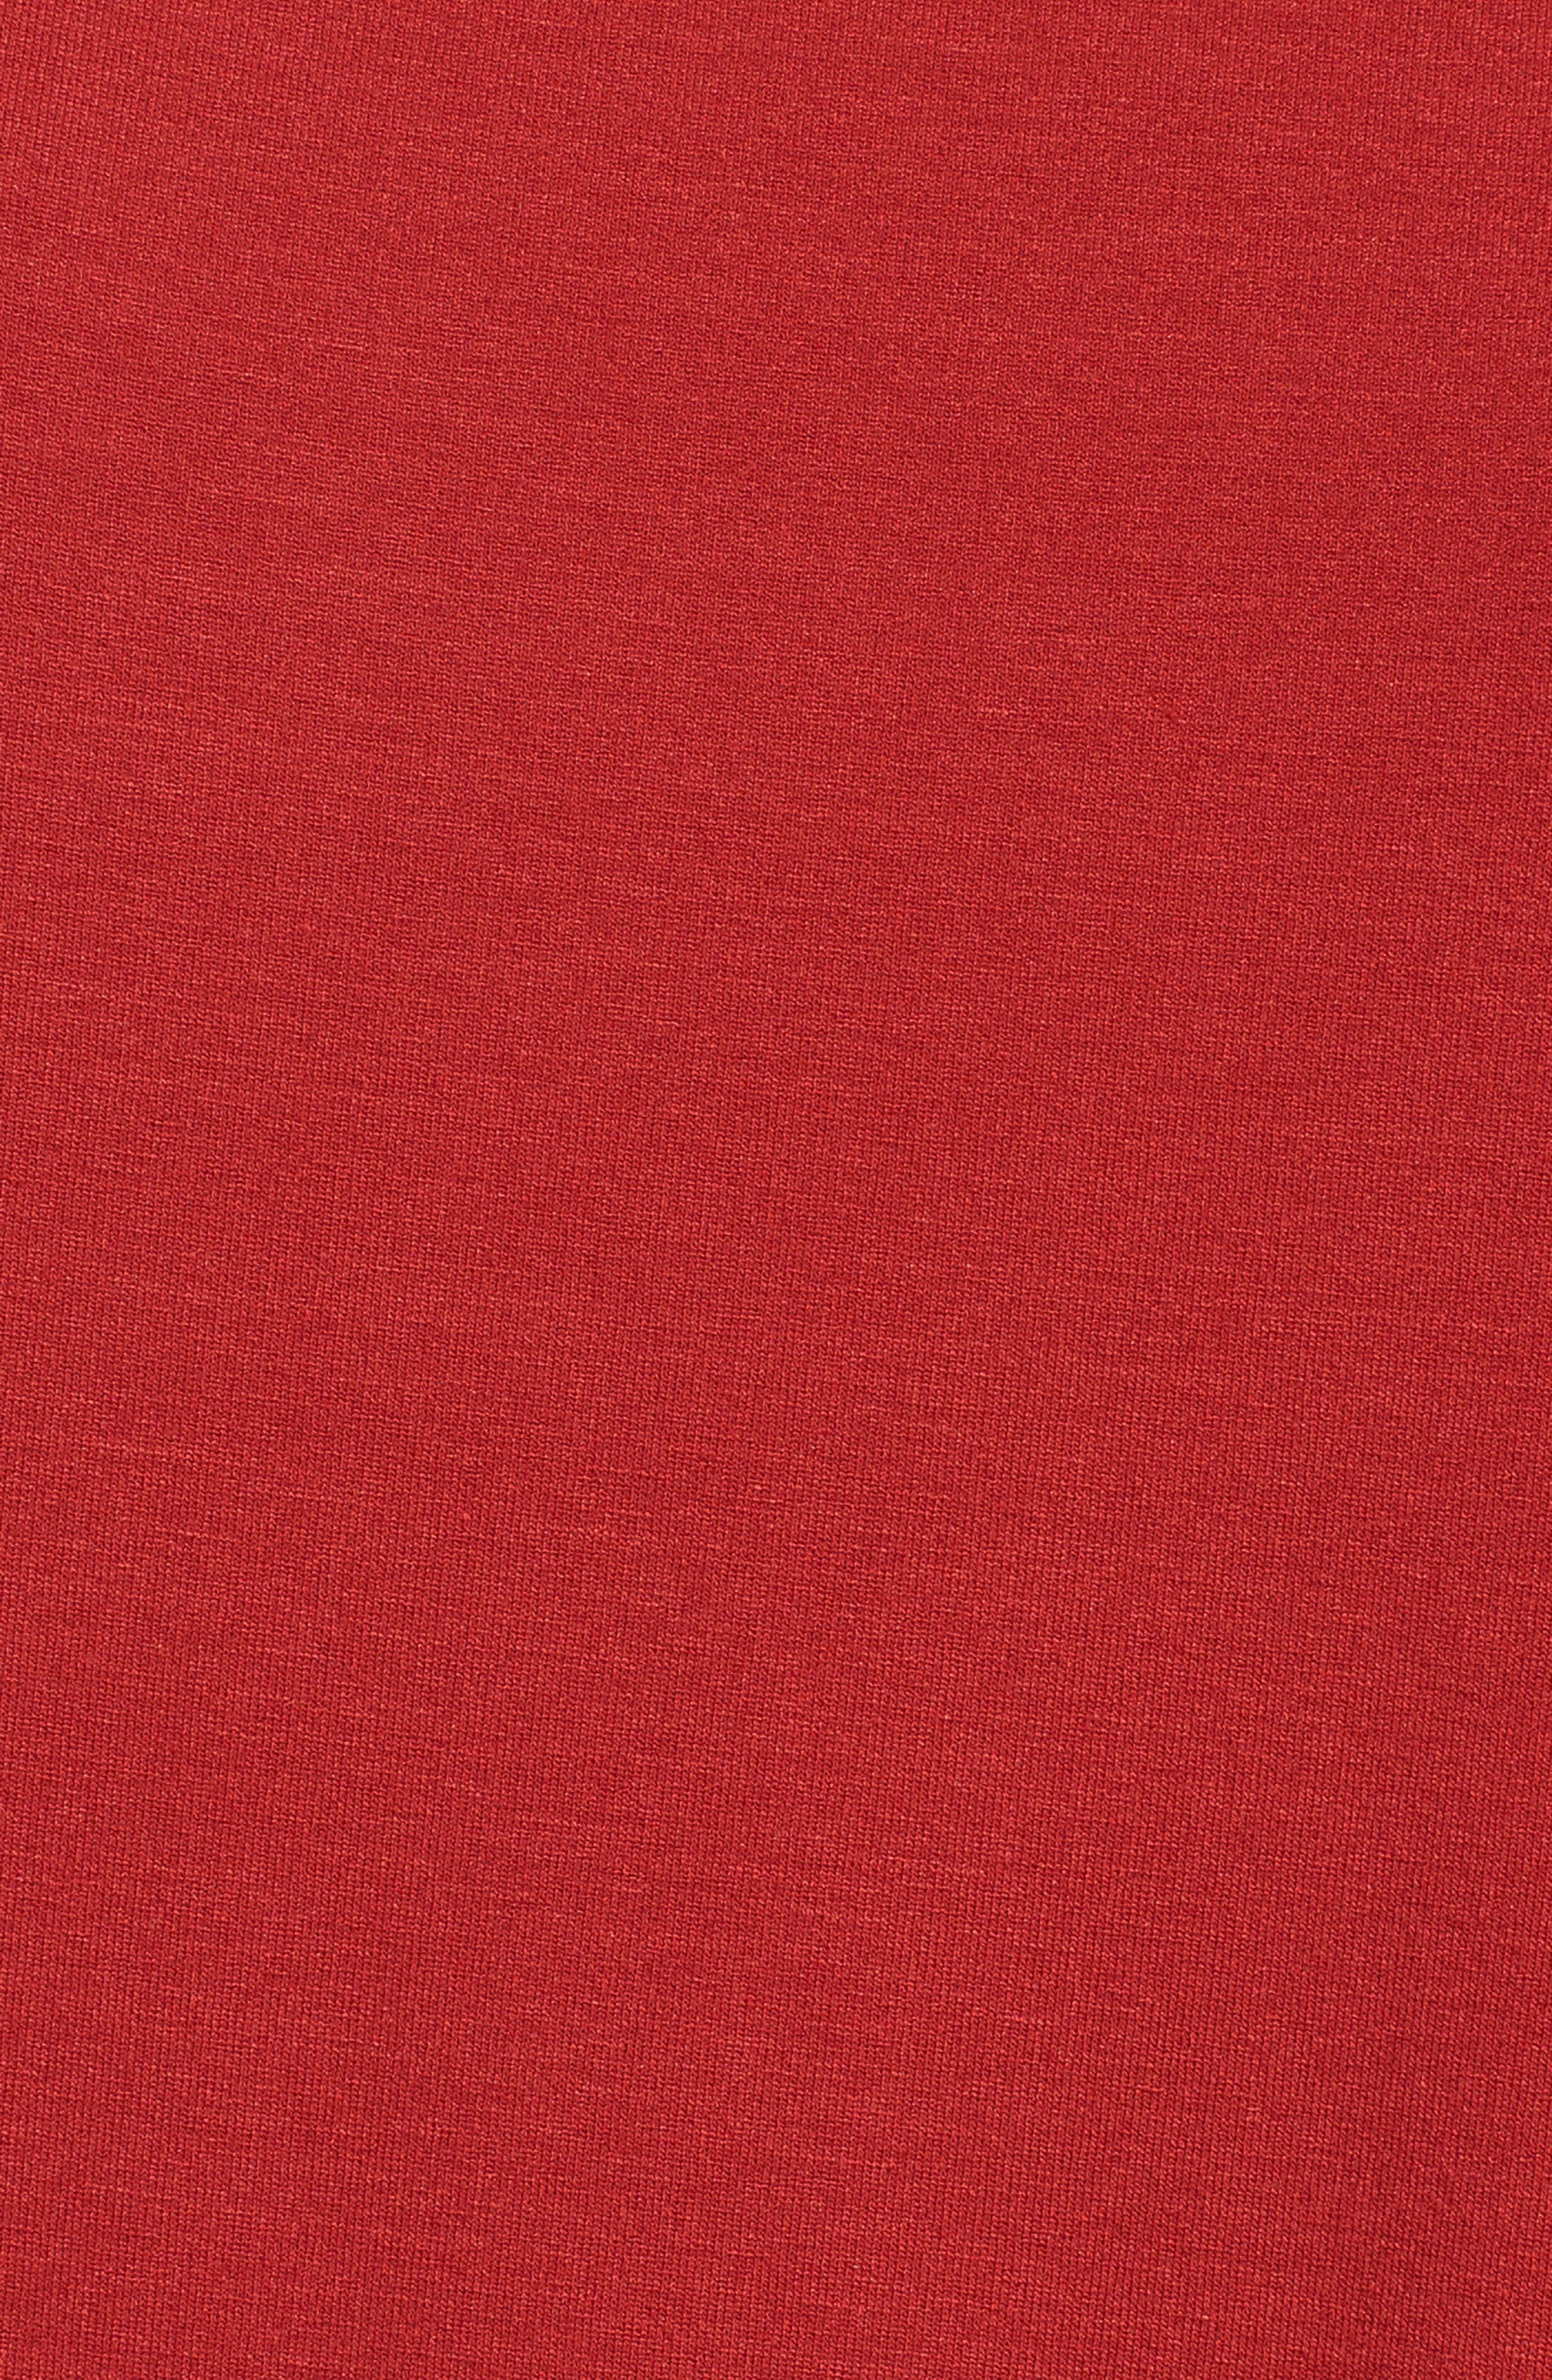 Asymmetrical Jersey Top,                             Alternate thumbnail 40, color,